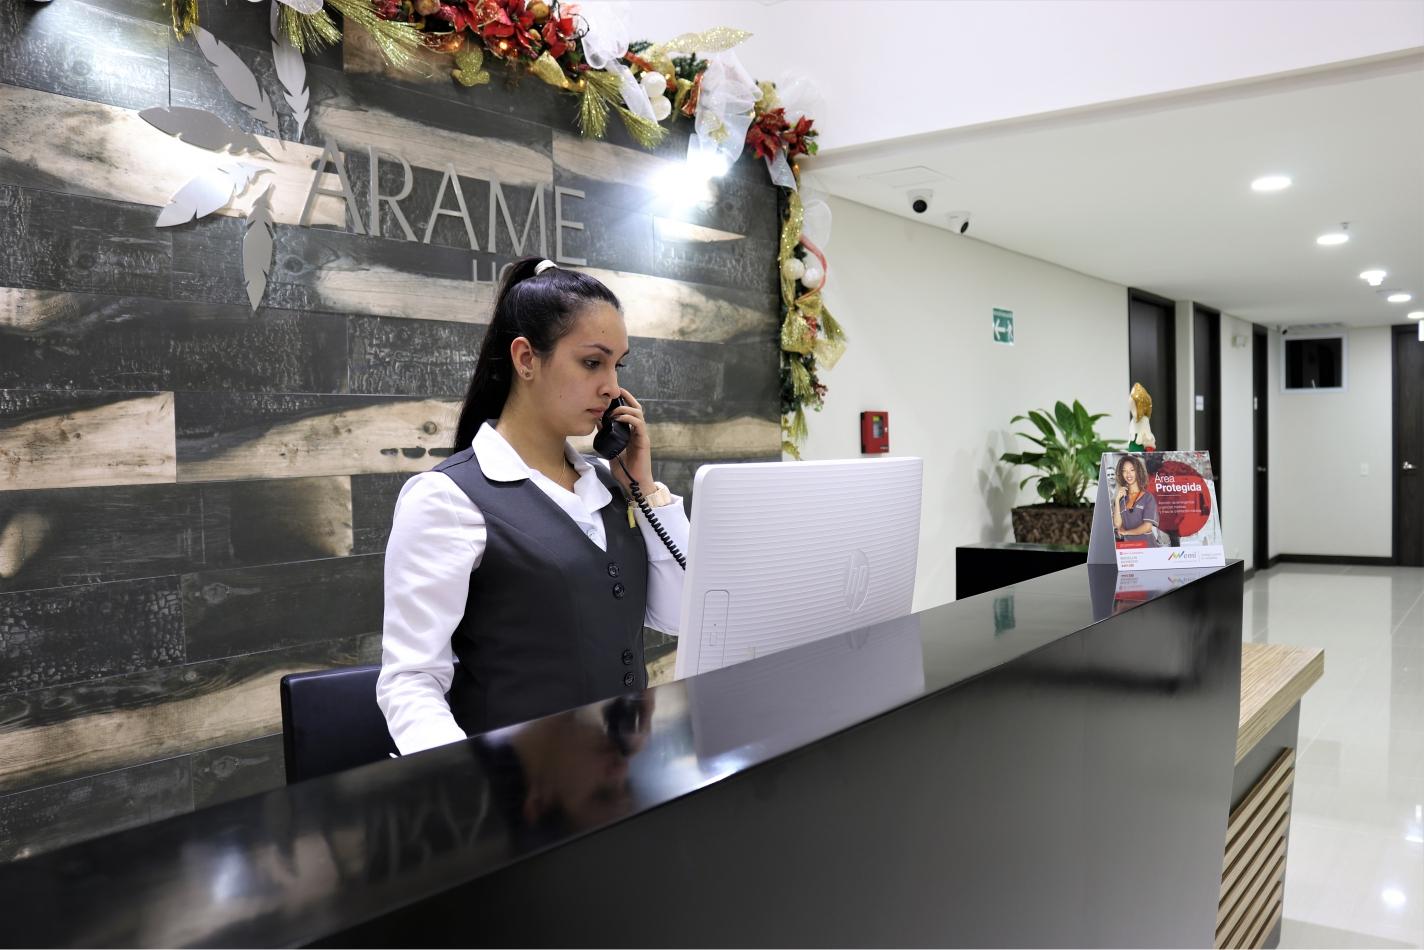 IM 5 Galeria Hotel Arame